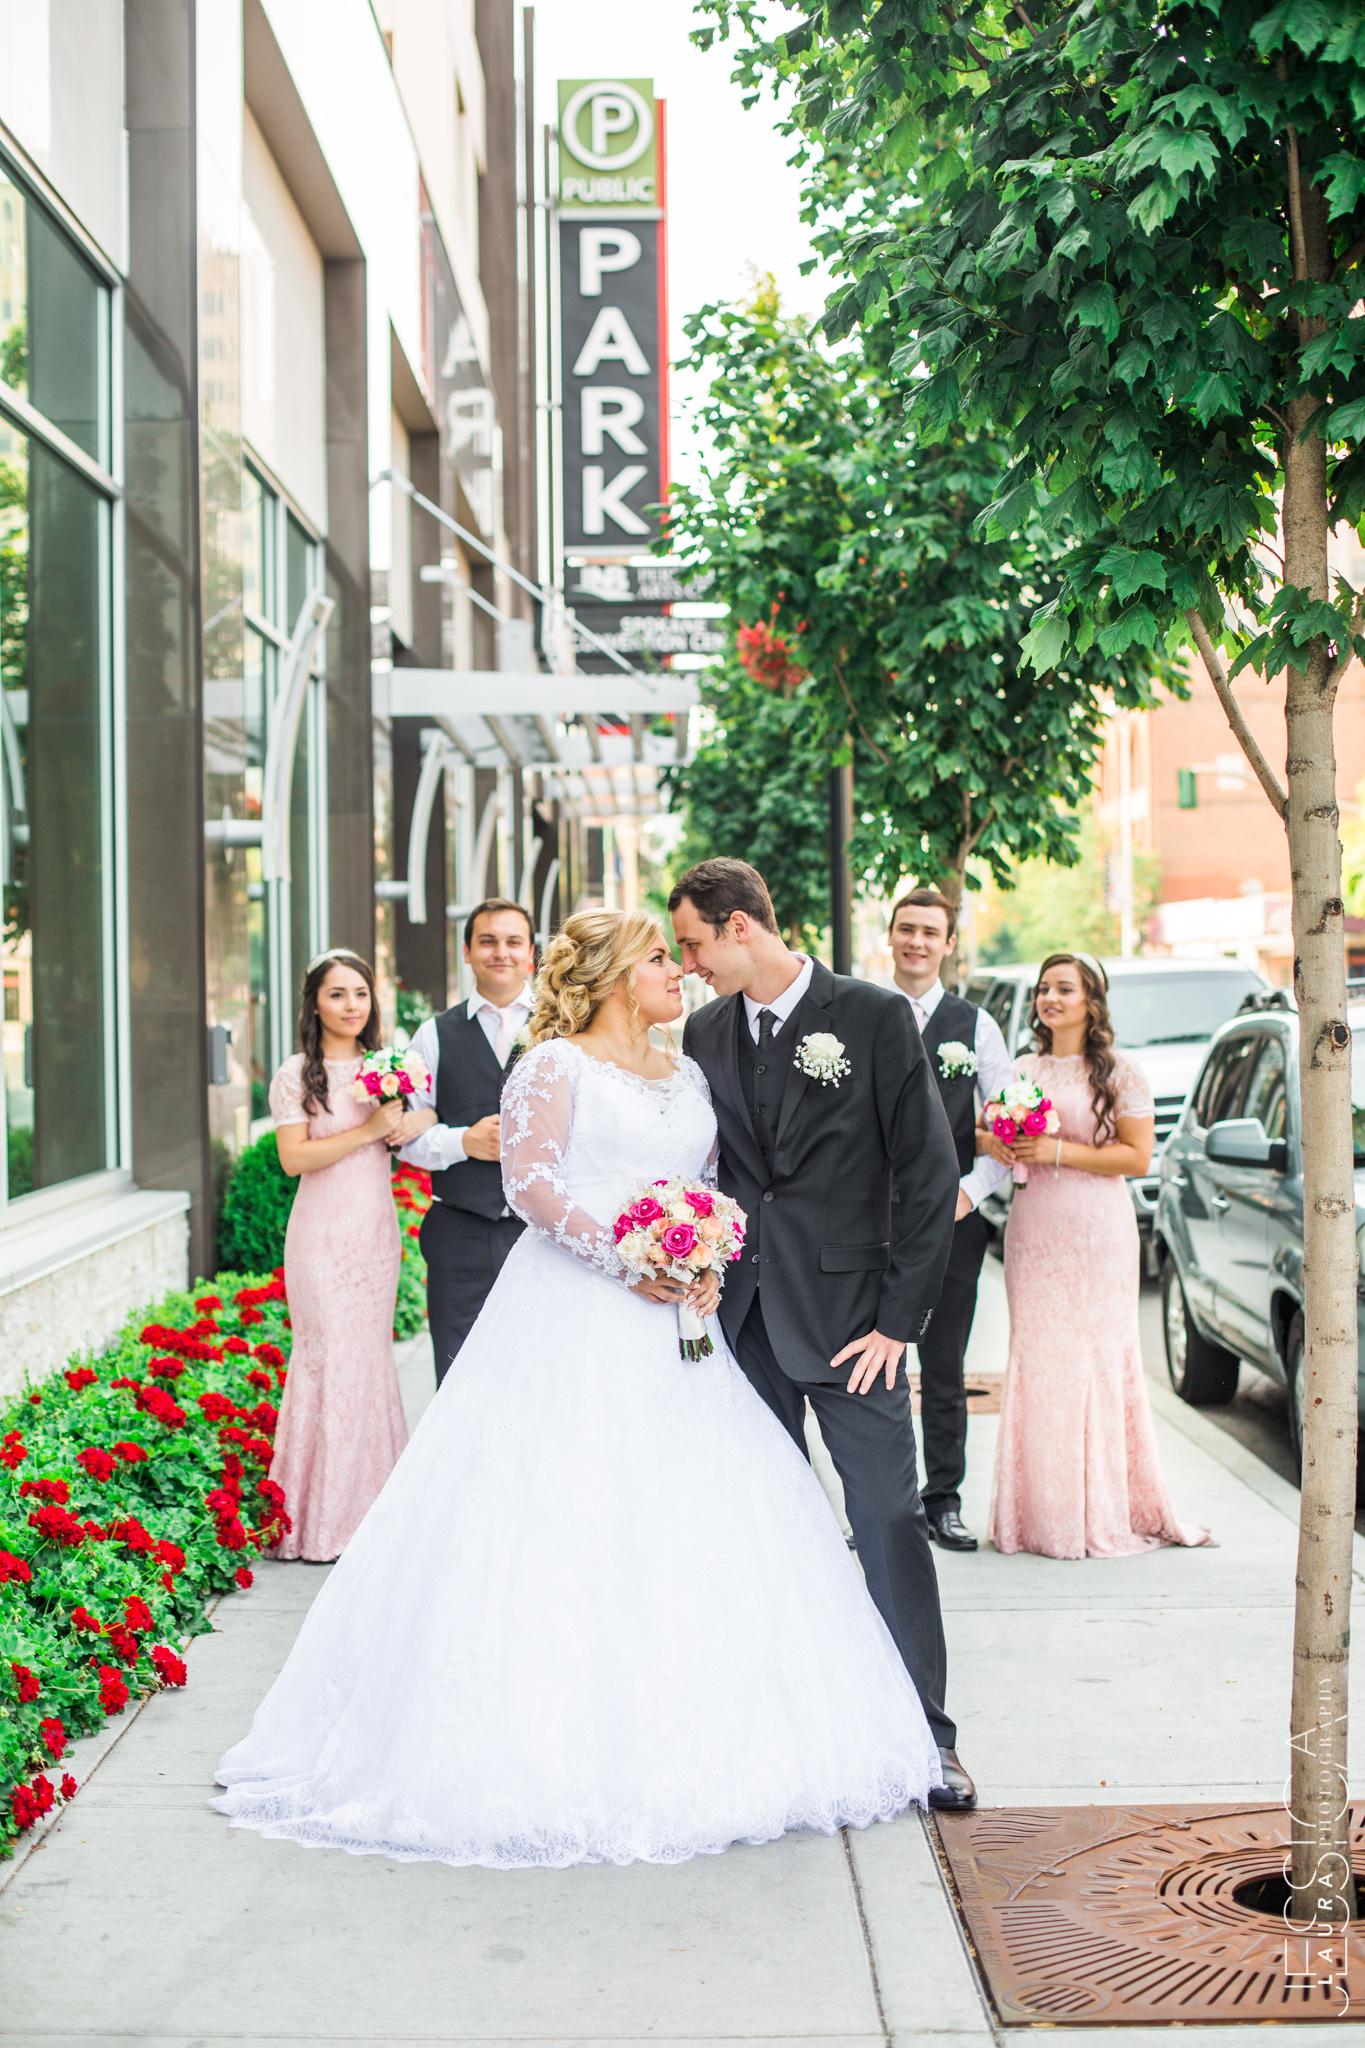 Eugene-Maryana_wedding_08062017_web (104 of 558).JPG